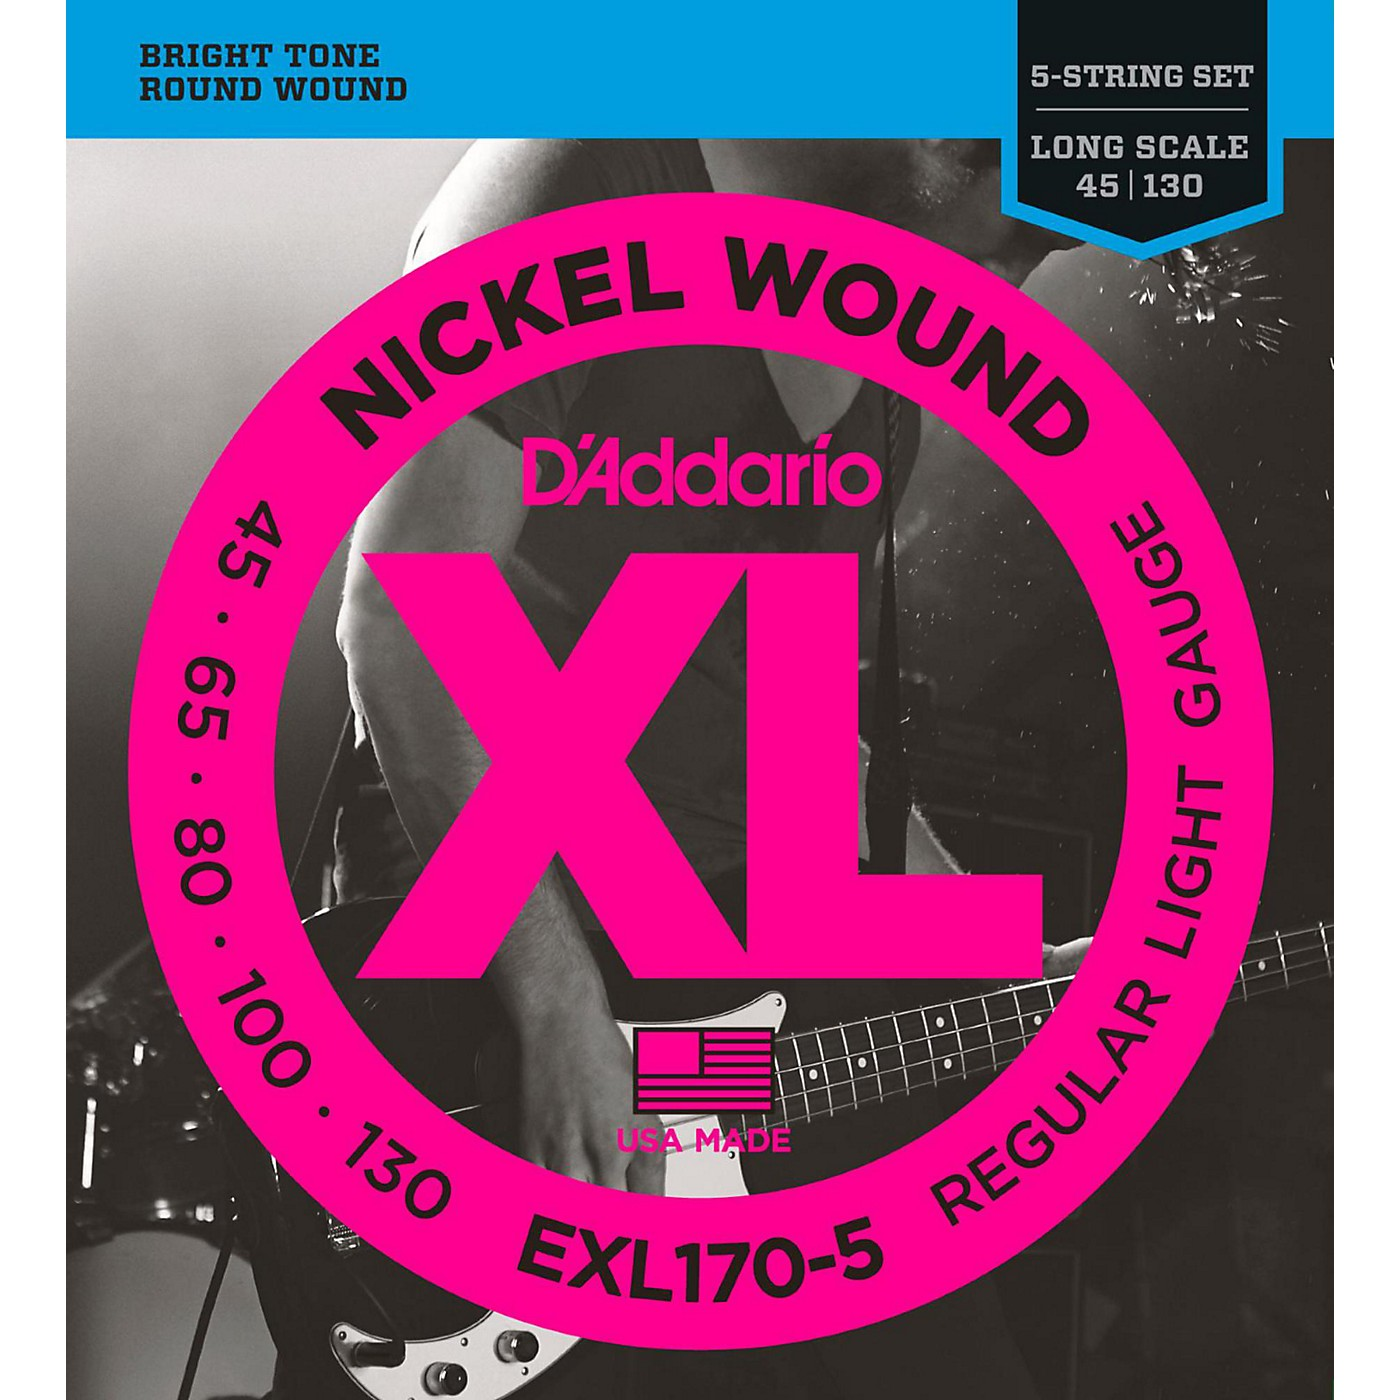 D'Addario EXL170-5 XL Nickel Round Wound 5-String Long Bass Strings thumbnail